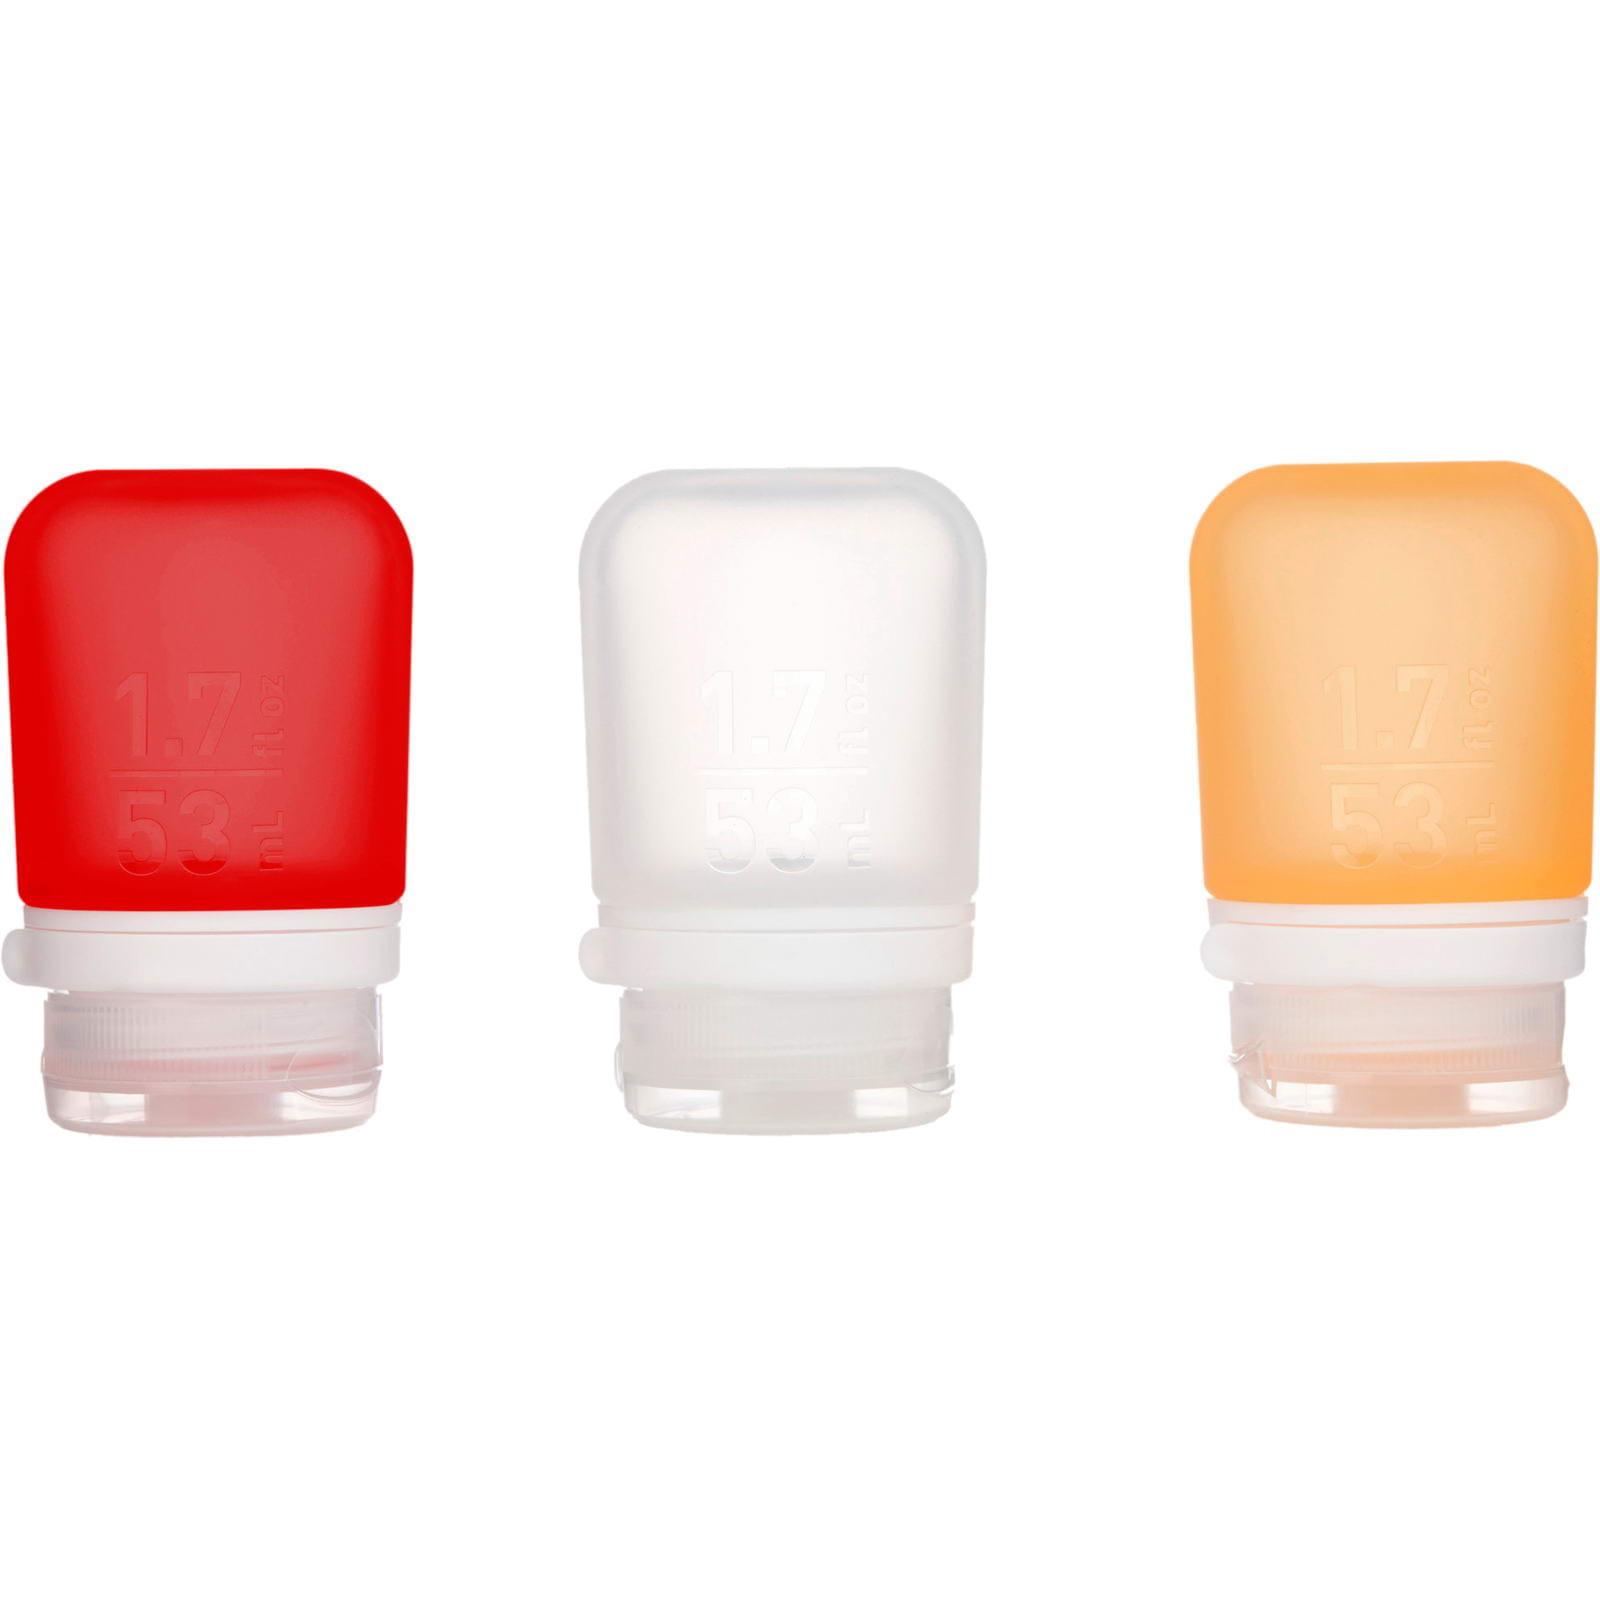 humangear GoToob 3er Pack - 3 x 53 ml Tube transparent-rot-orange - Bild 2